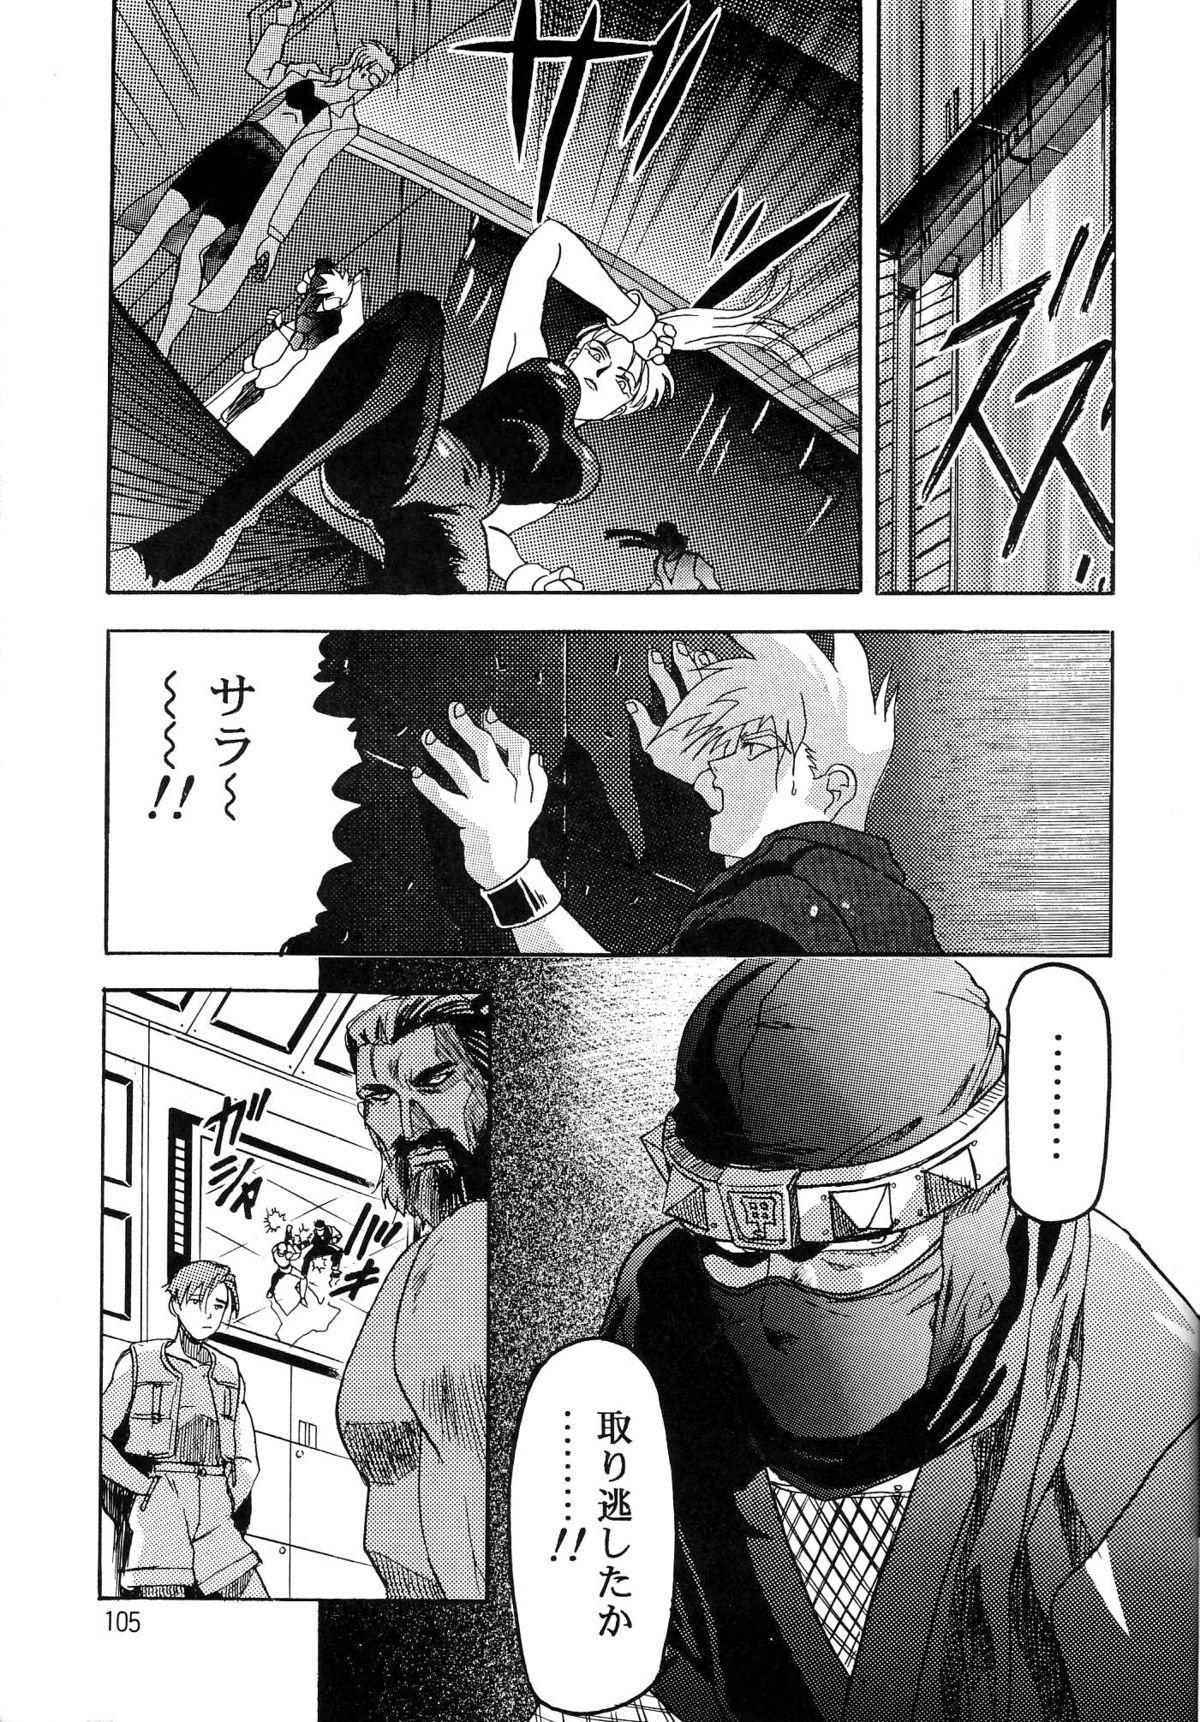 Hen Rei Kai Special Vol. 9 106